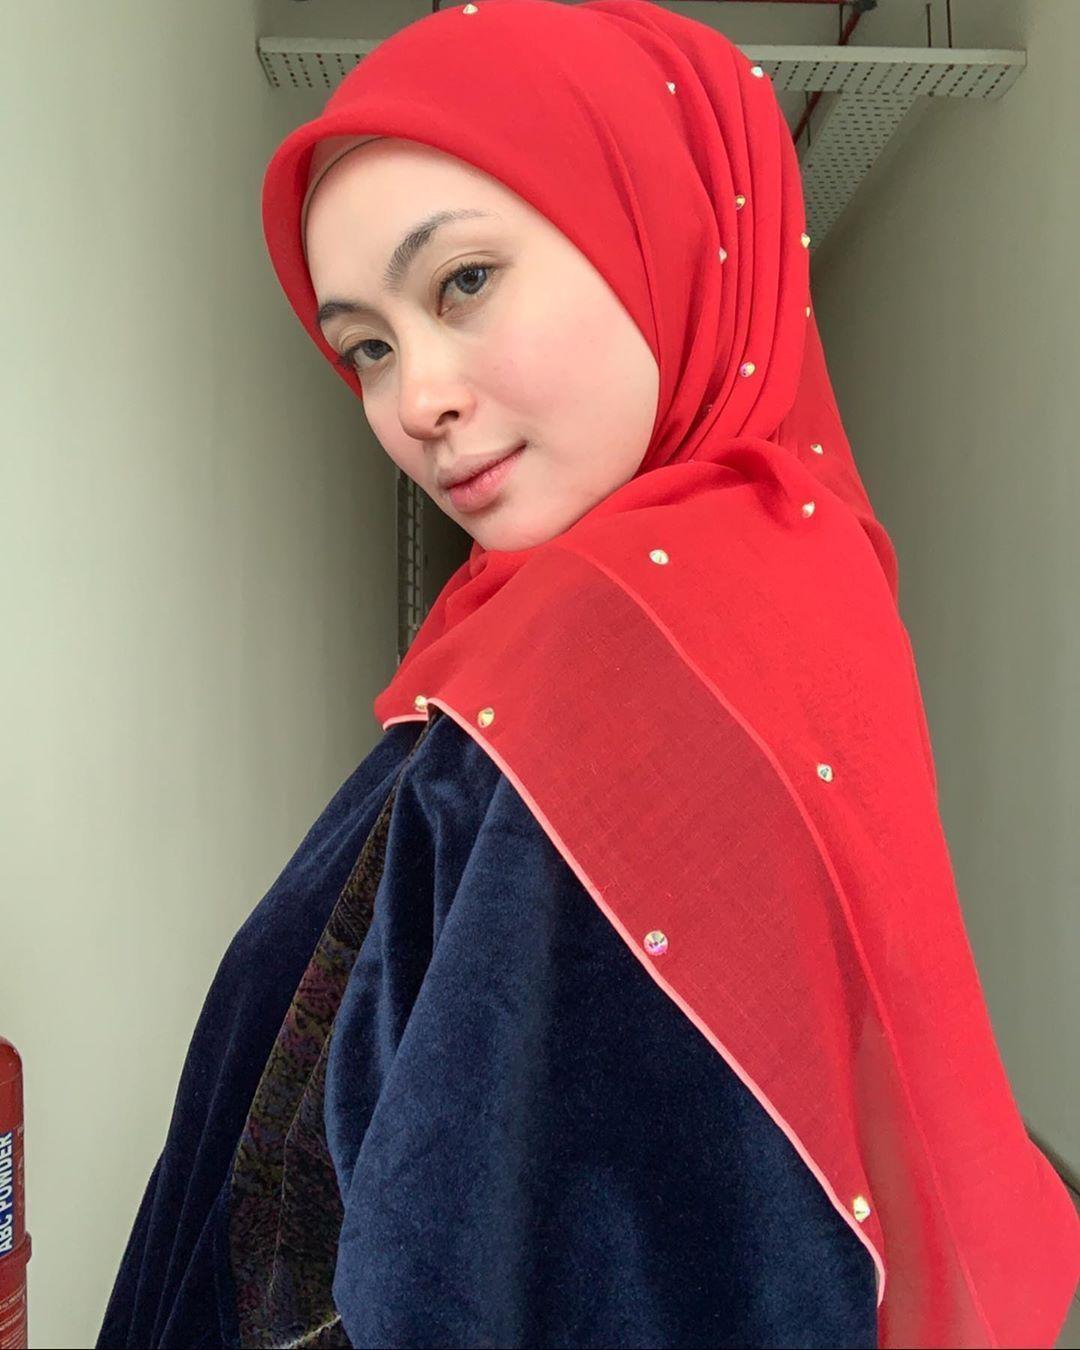 Awek Kastam Tudung Big Ass Malay Hot Pretty Nice Boobs Xvideos Com